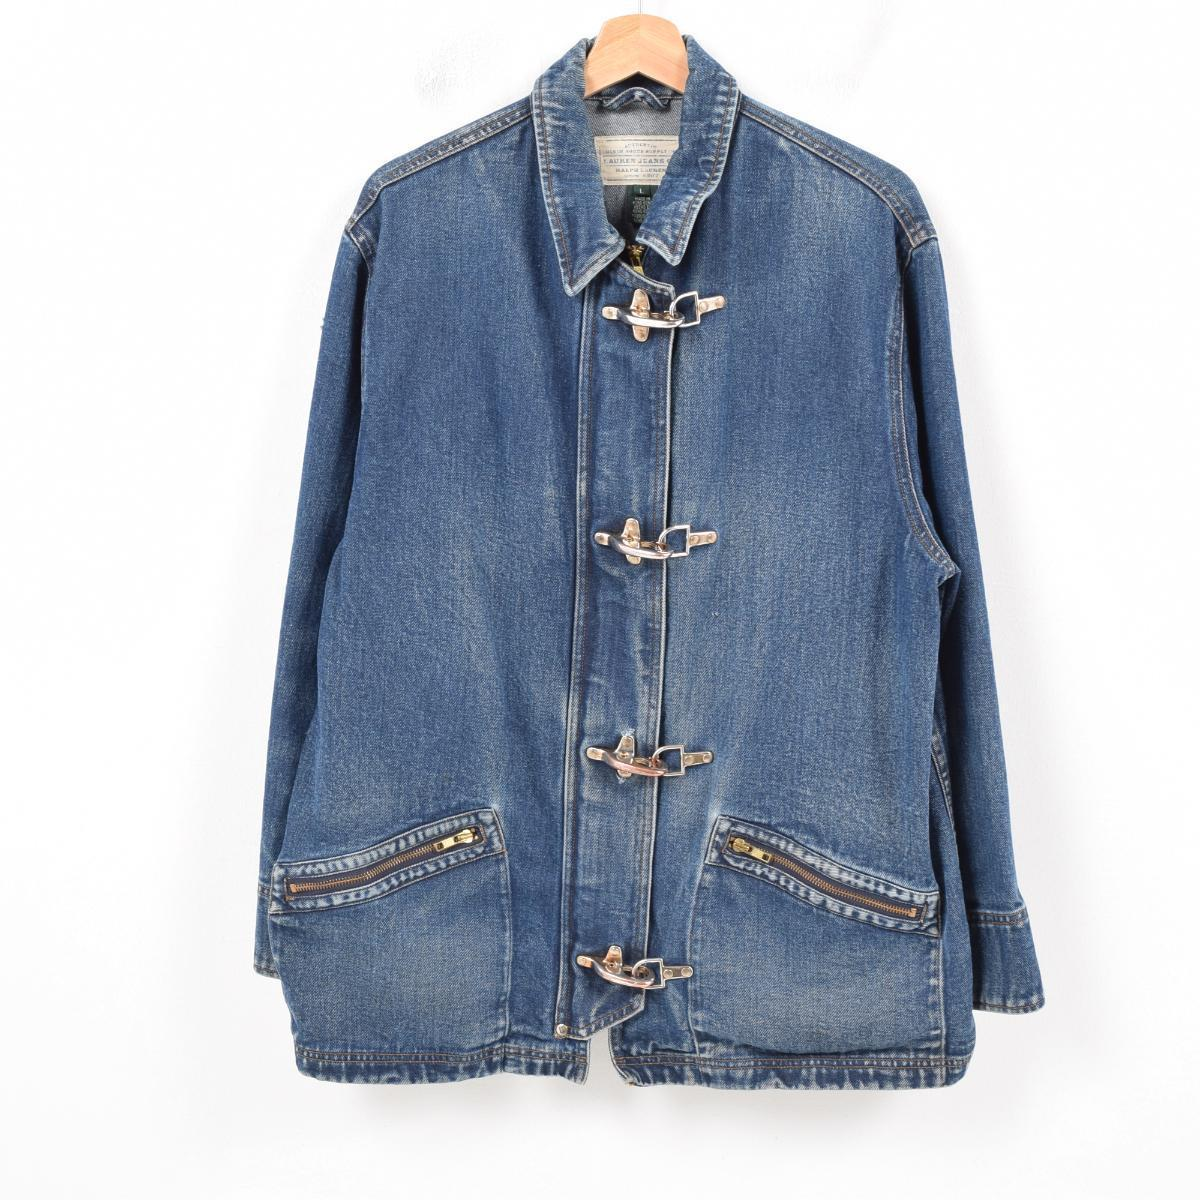 bf42df009a Ralph Lauren Ralph Lauren LAUREN JEANS CO denim fireman jacket Lady's XL  /wau7887